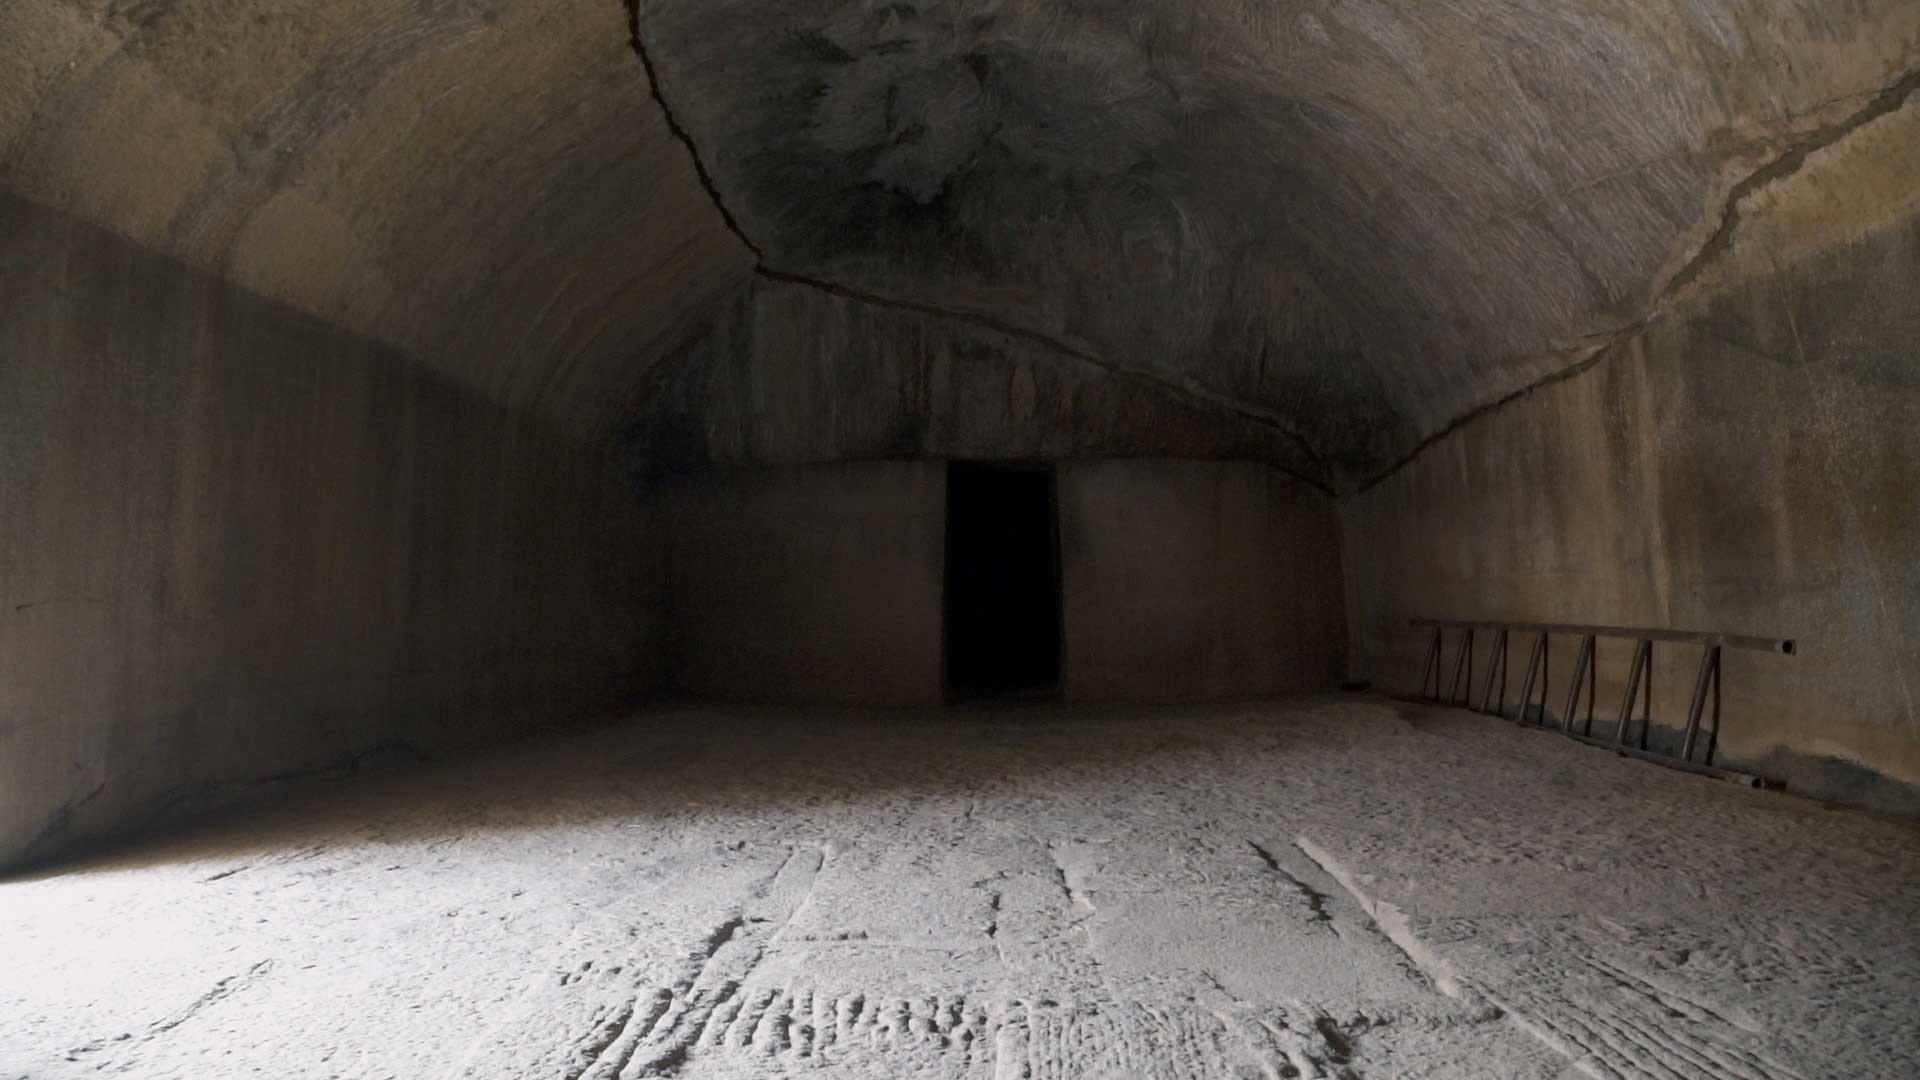 Barabar-BAM-film-granit-miroir-pyramide-inde-yoga-archeologie-13